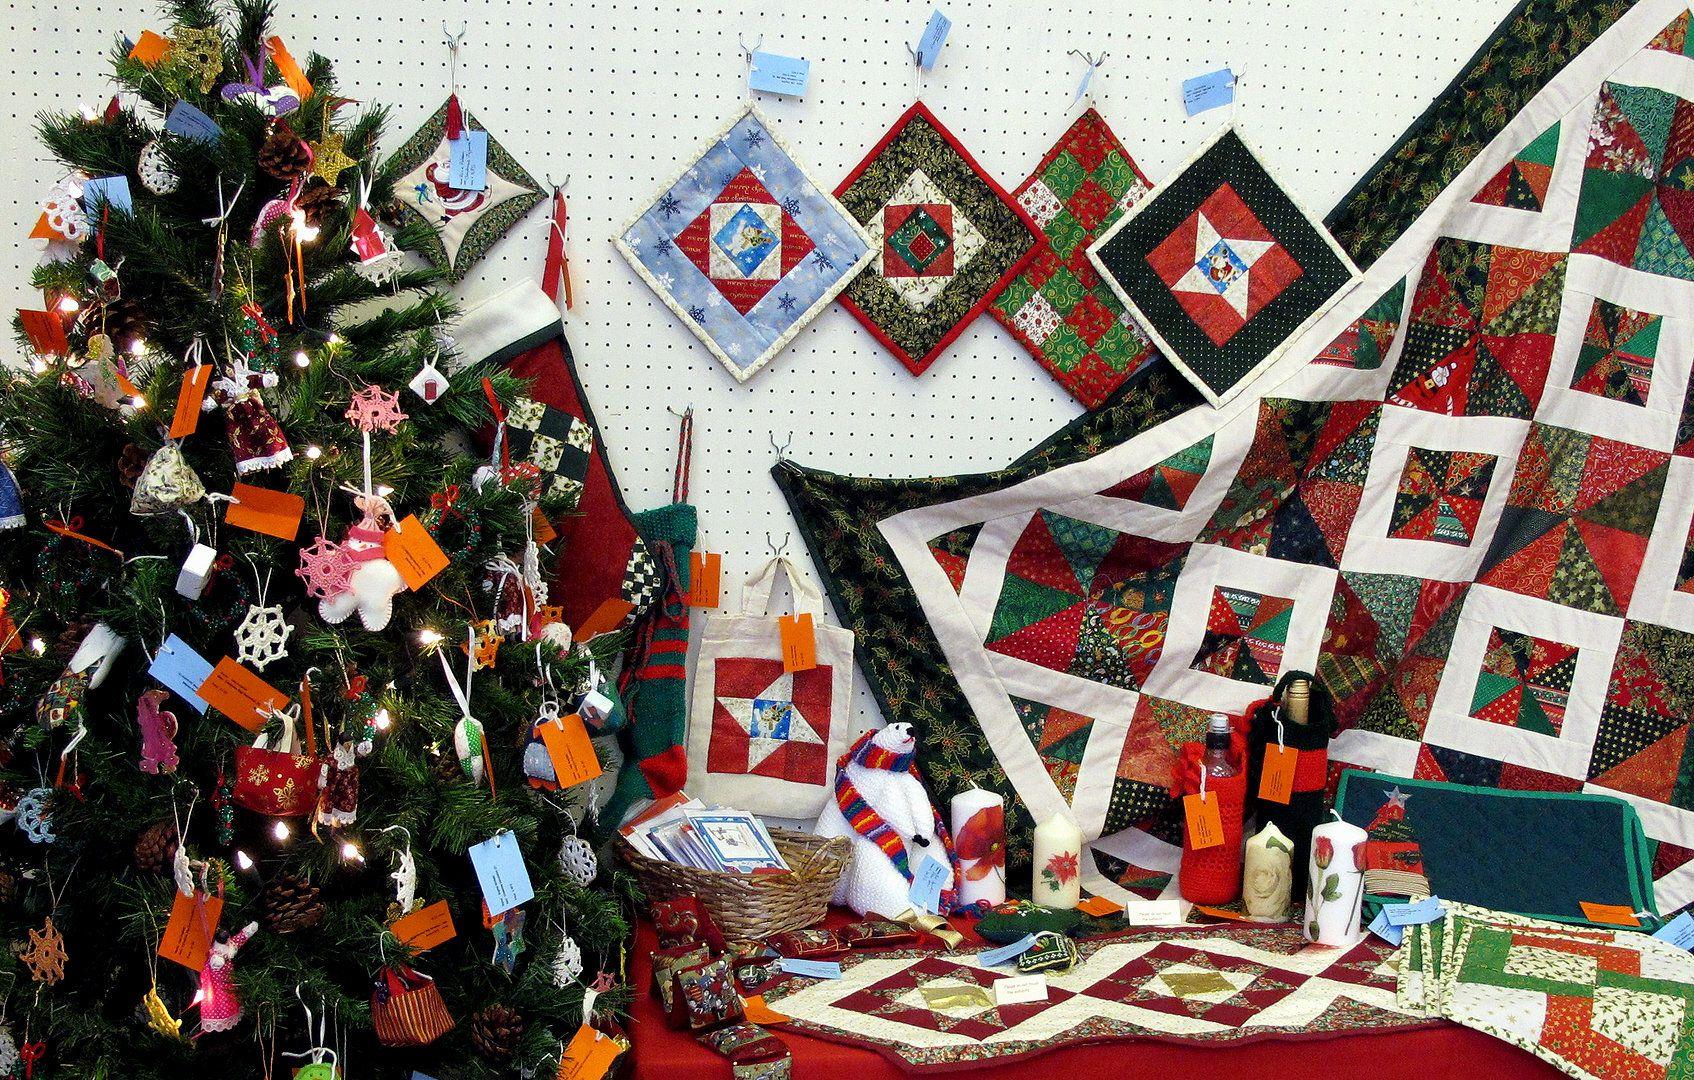 handmade abbigli gifts abbiglievents presents holidayseason